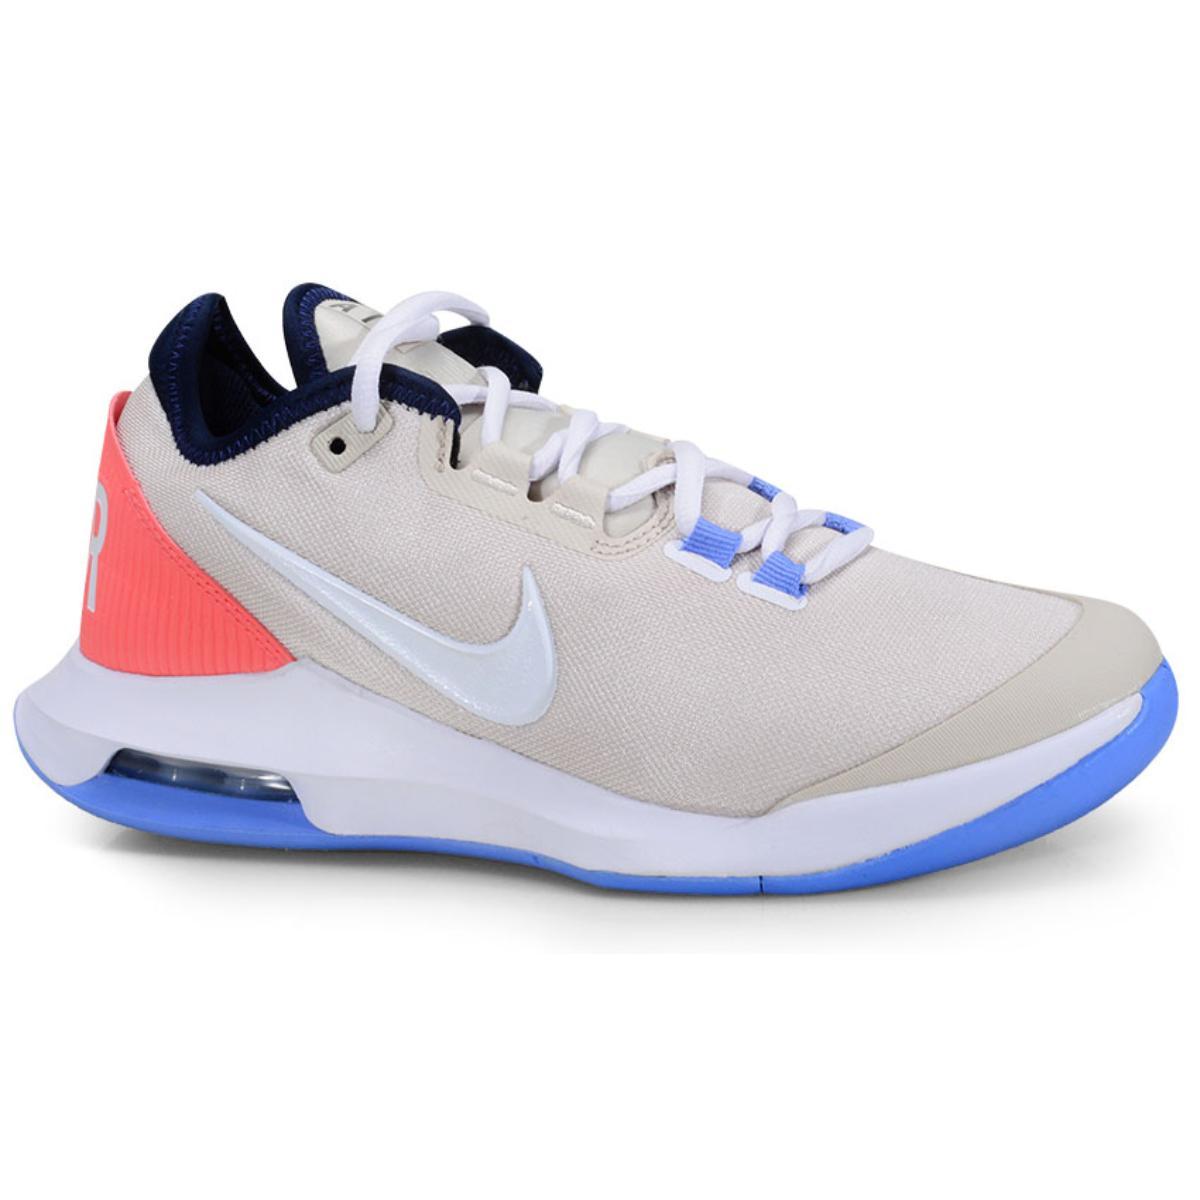 Tênis Feminino Nike Ao7353-102 Air Max Wildcard Bege/pêssego/azul